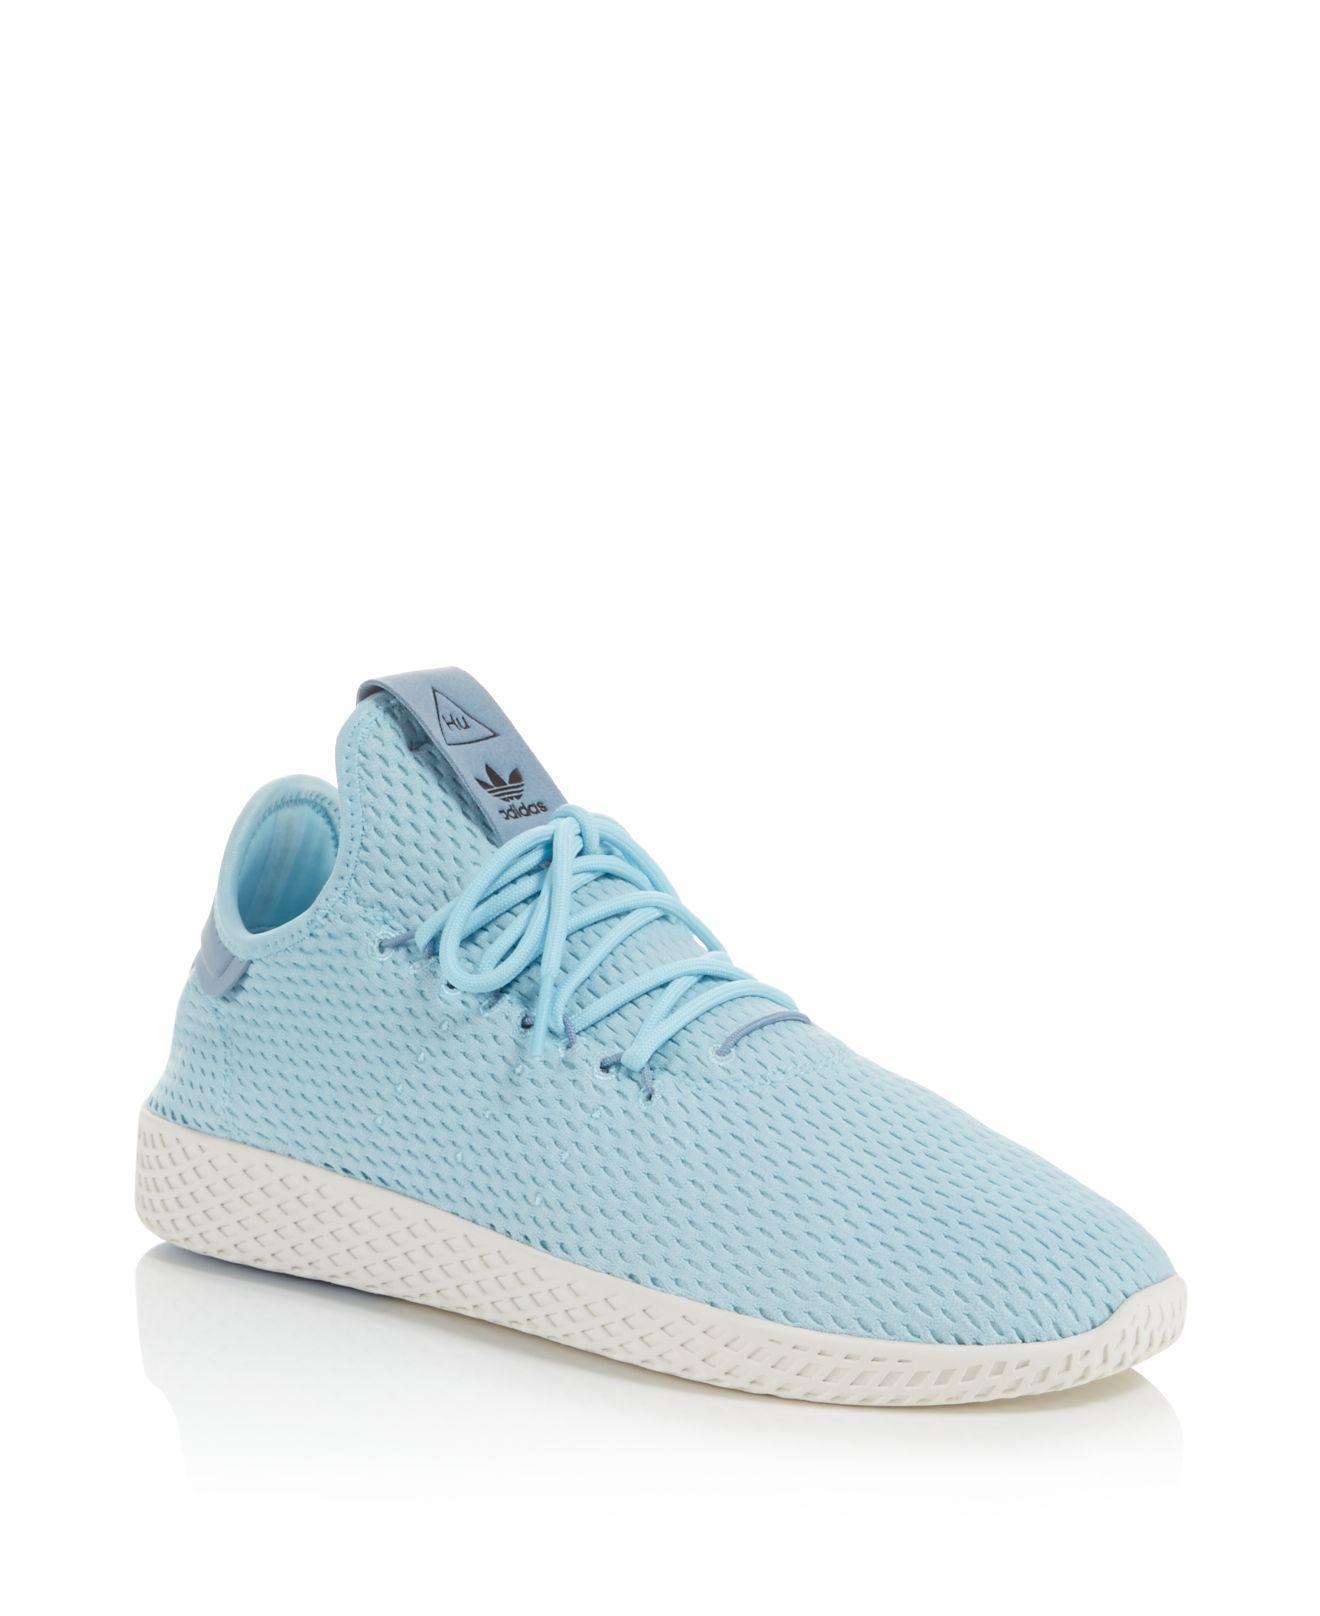 d761163d8 Lyst - adidas X Pharrell Williams Men s Human Race Trainer Sneakers ...